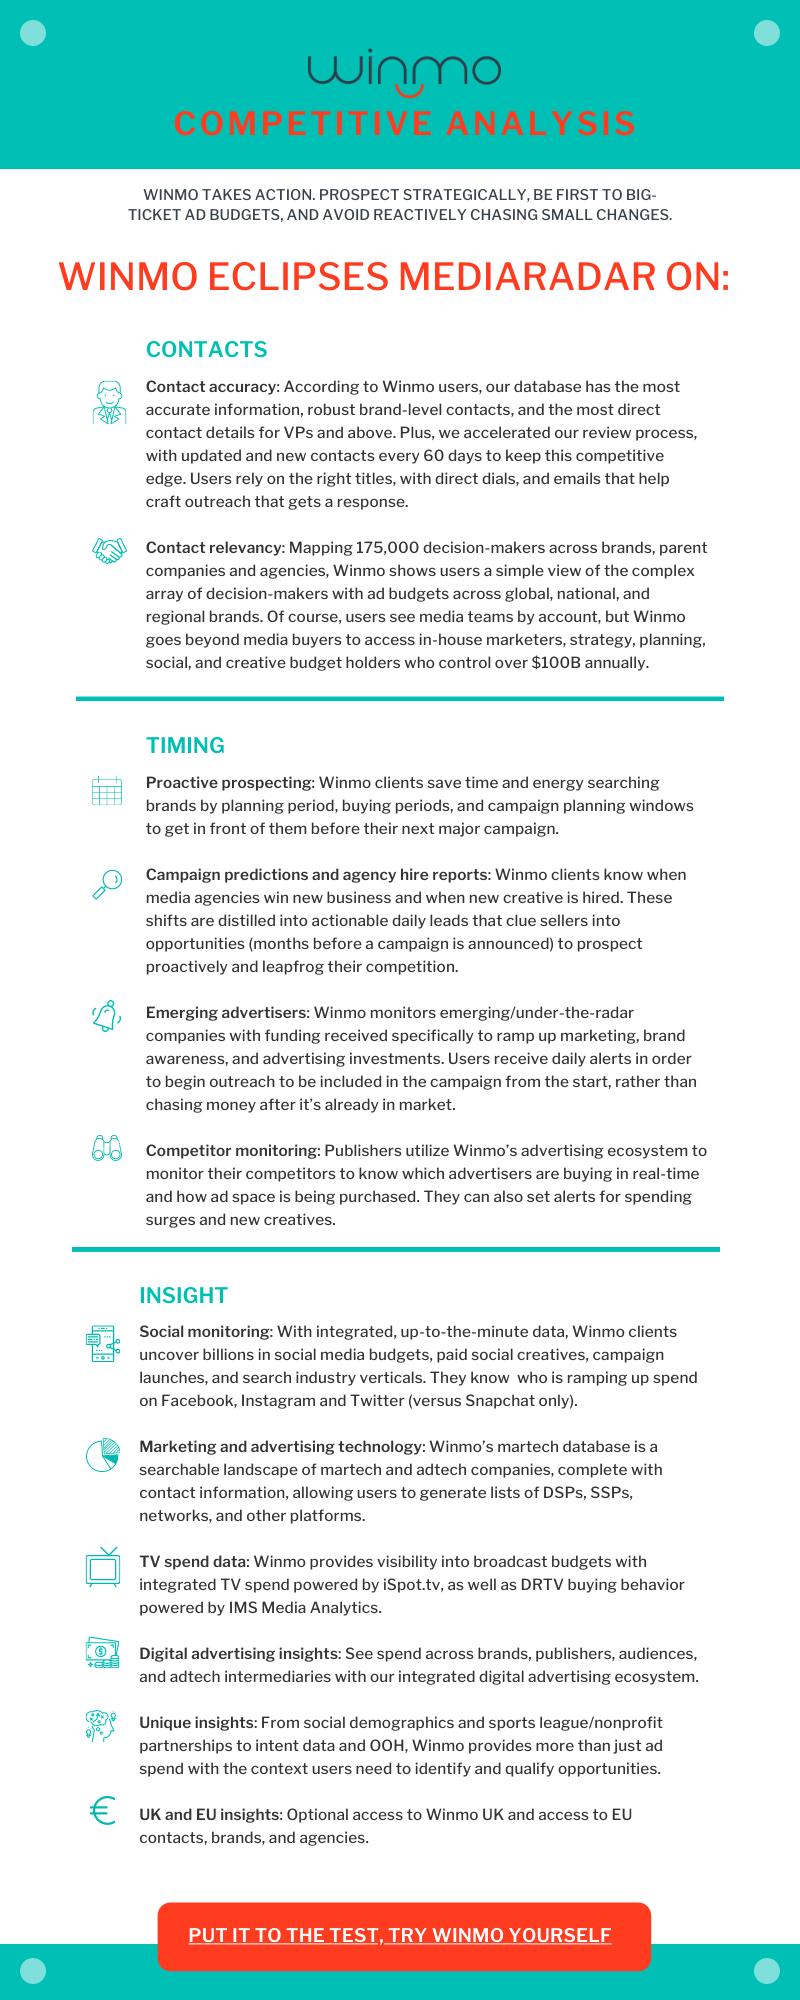 Winmo v. MediaRadar Competitor Analysis June 2021